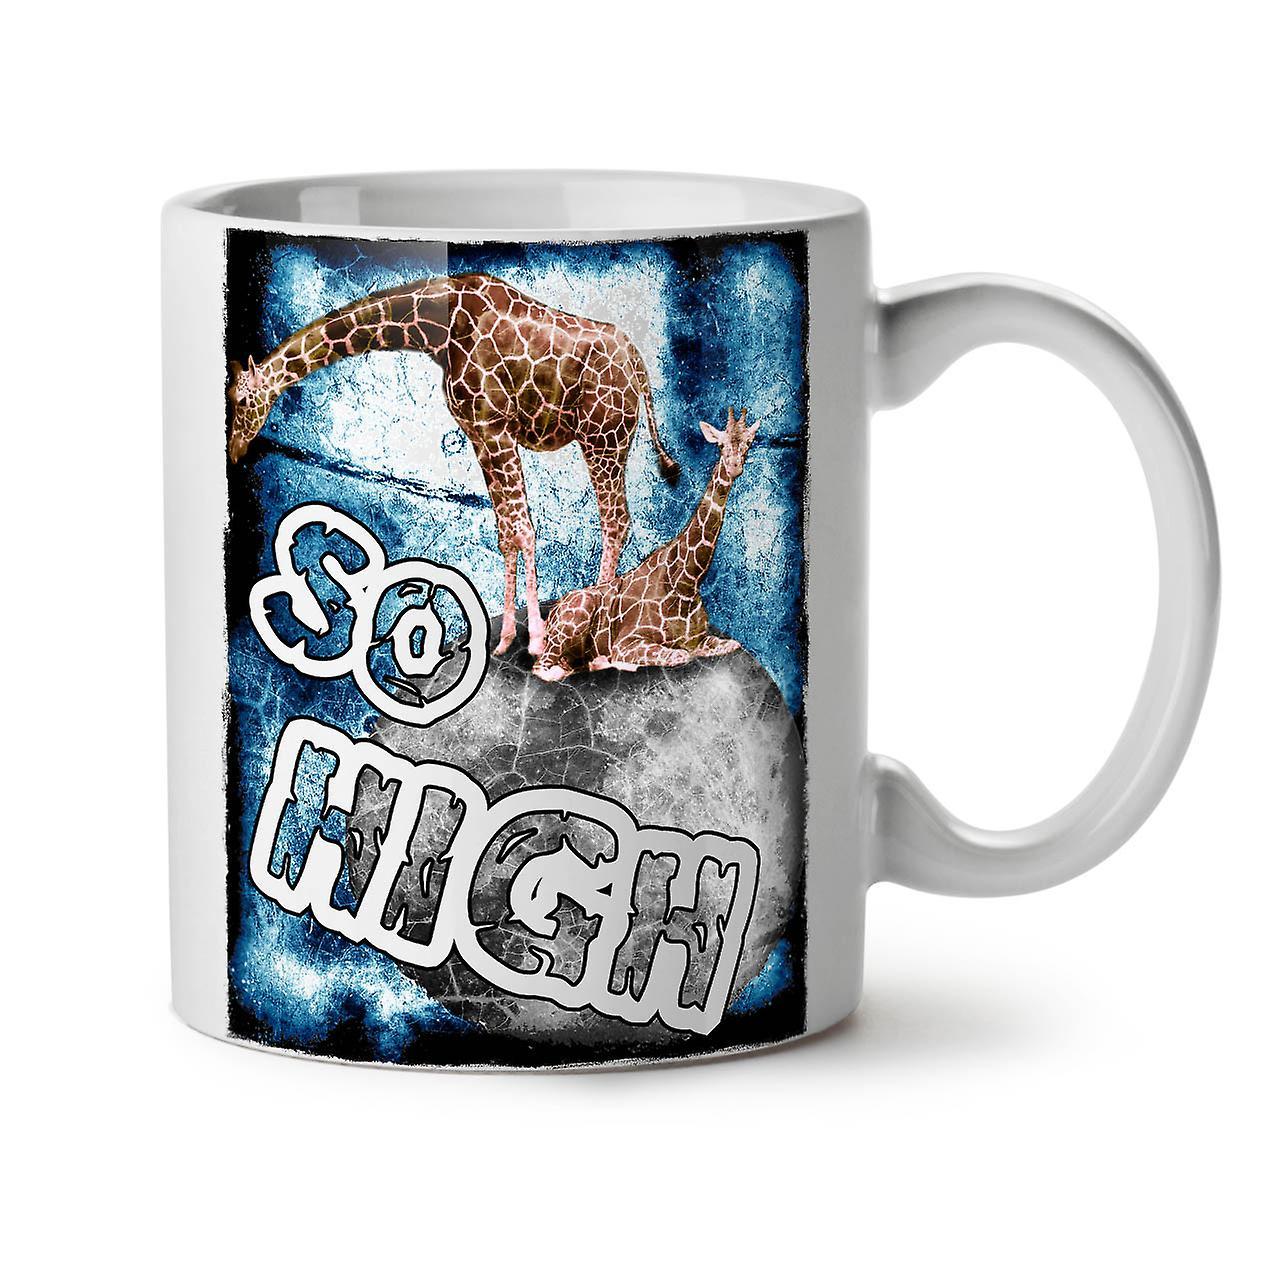 420 New Tea White 11 Coffee Ceramic High OzWellcoda Mug Giraffe Rq4A3cL5j